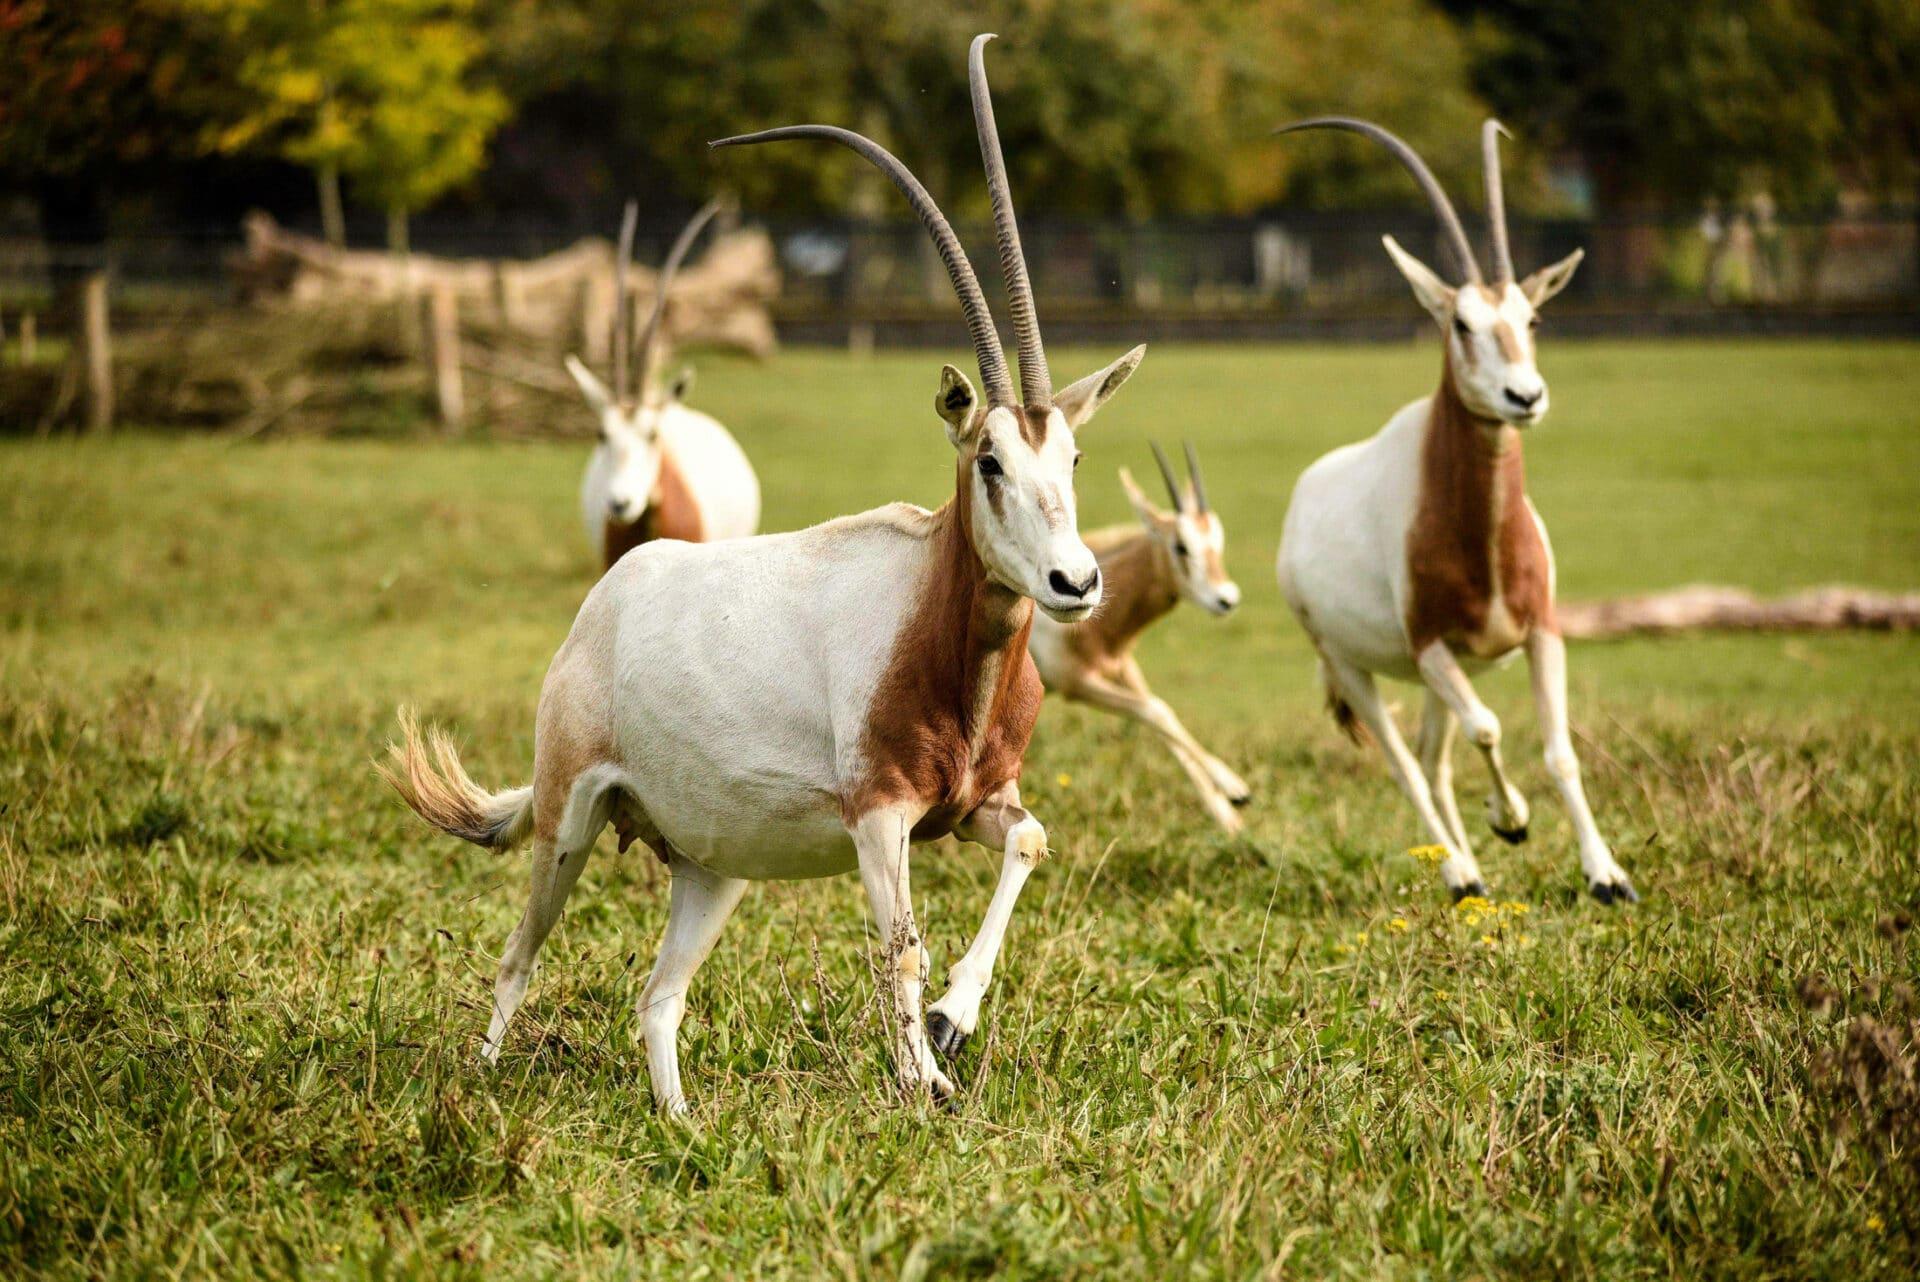 Scimitar Horned Oryx Oryx Dammah Marwell Zoo Hannah Pearce Scimitar Horned Oryx